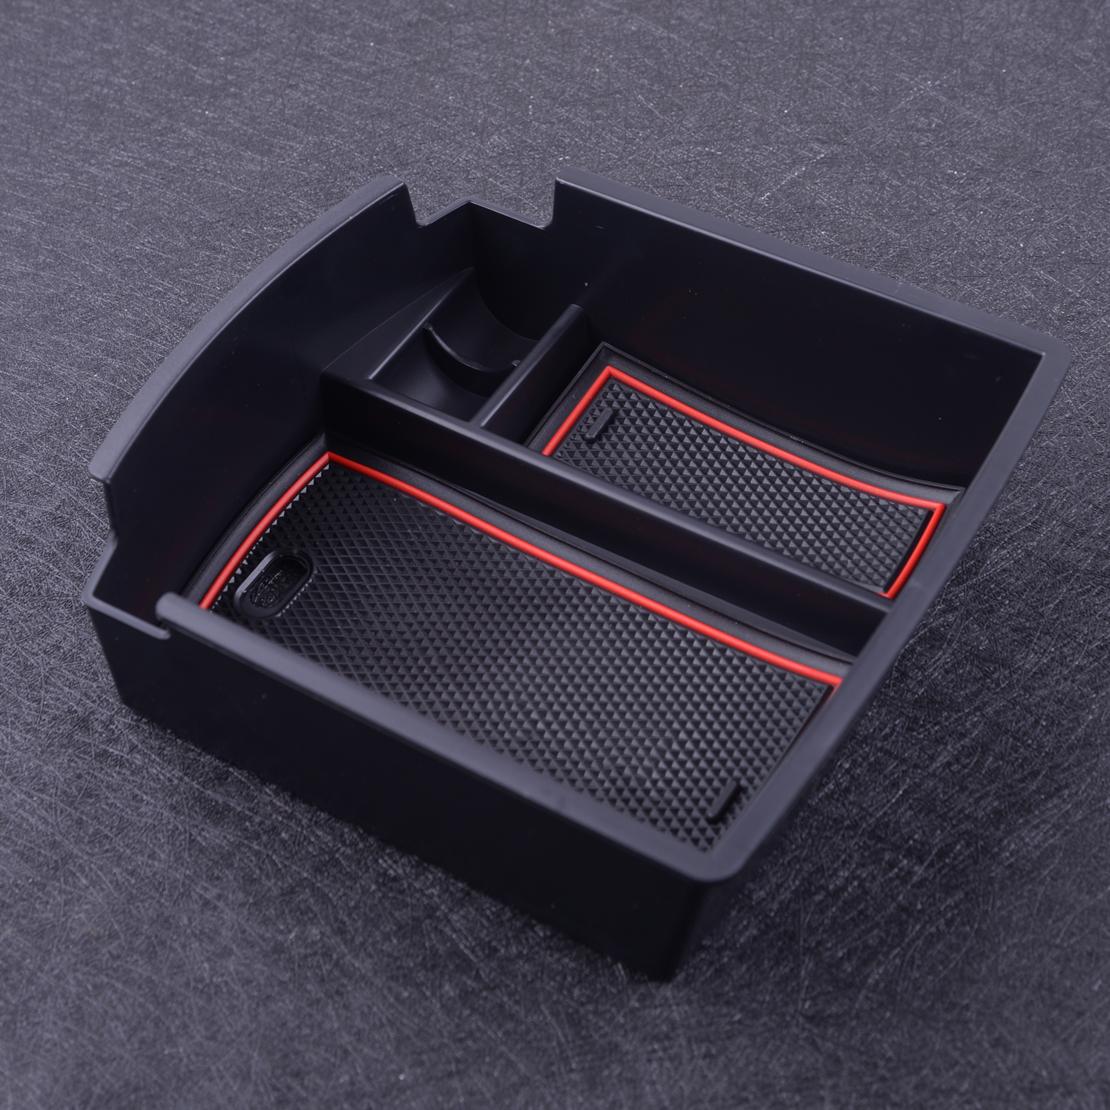 Black Car Storage Box Assesories,Auto Center Console Organizer Tray Armrest Container Fit for Hyundai Elantra 17-18